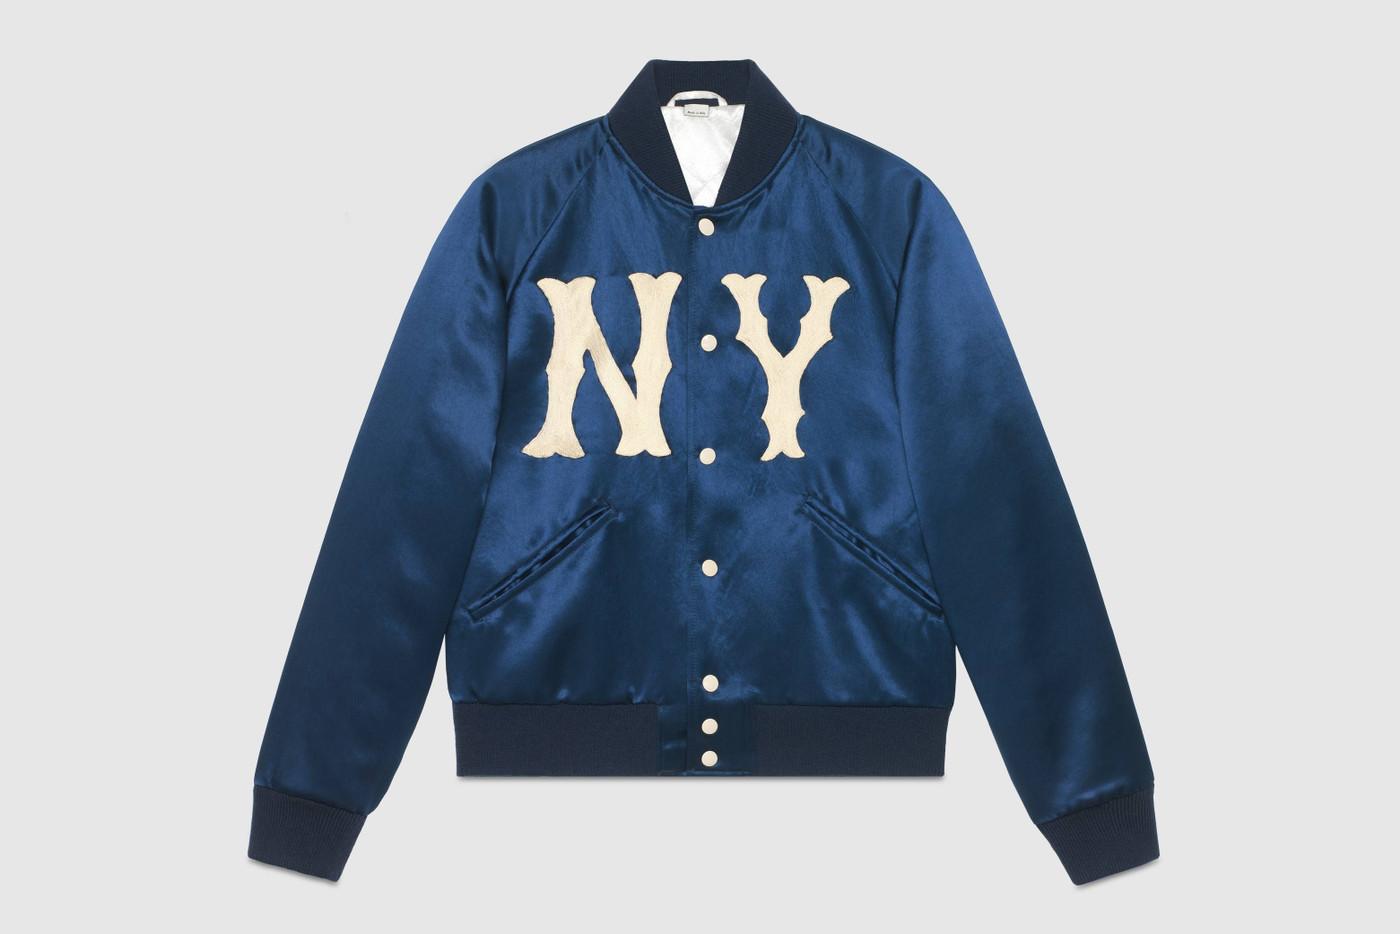 yankees-gucci-apparel-6 – Copy